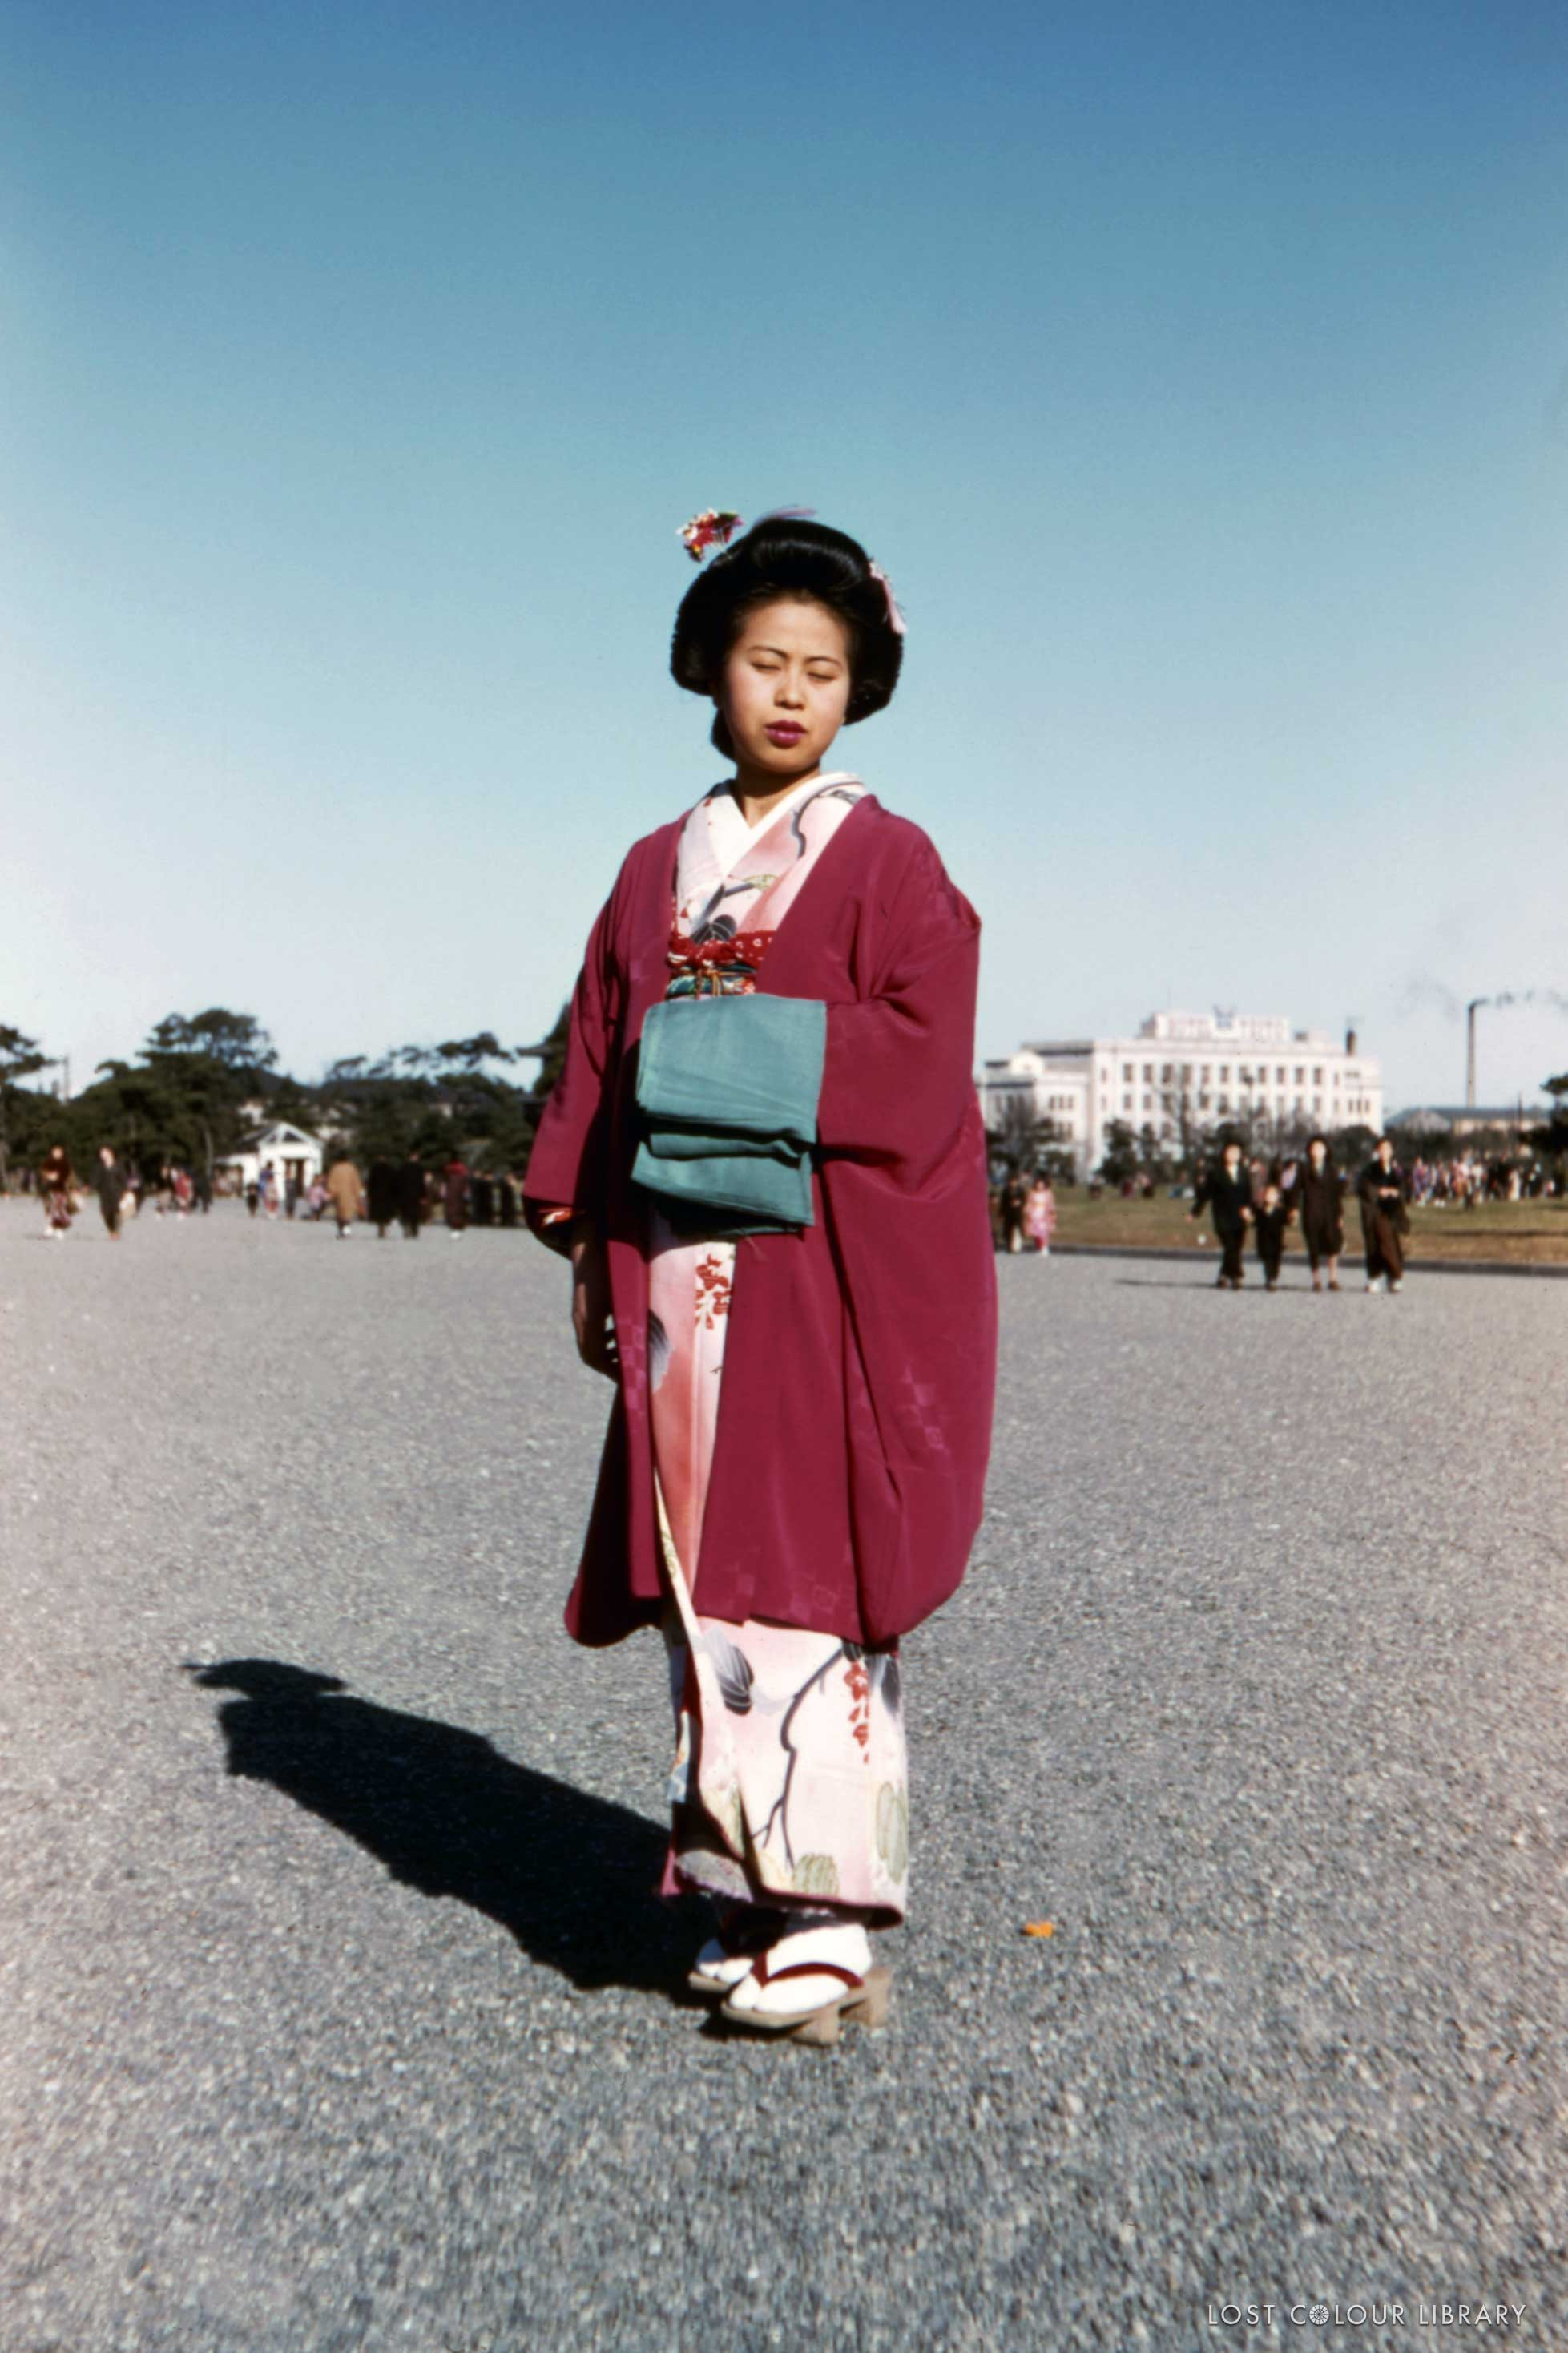 lcl-ww-japanese-woman-traditional-1940s-site-wm.jpg